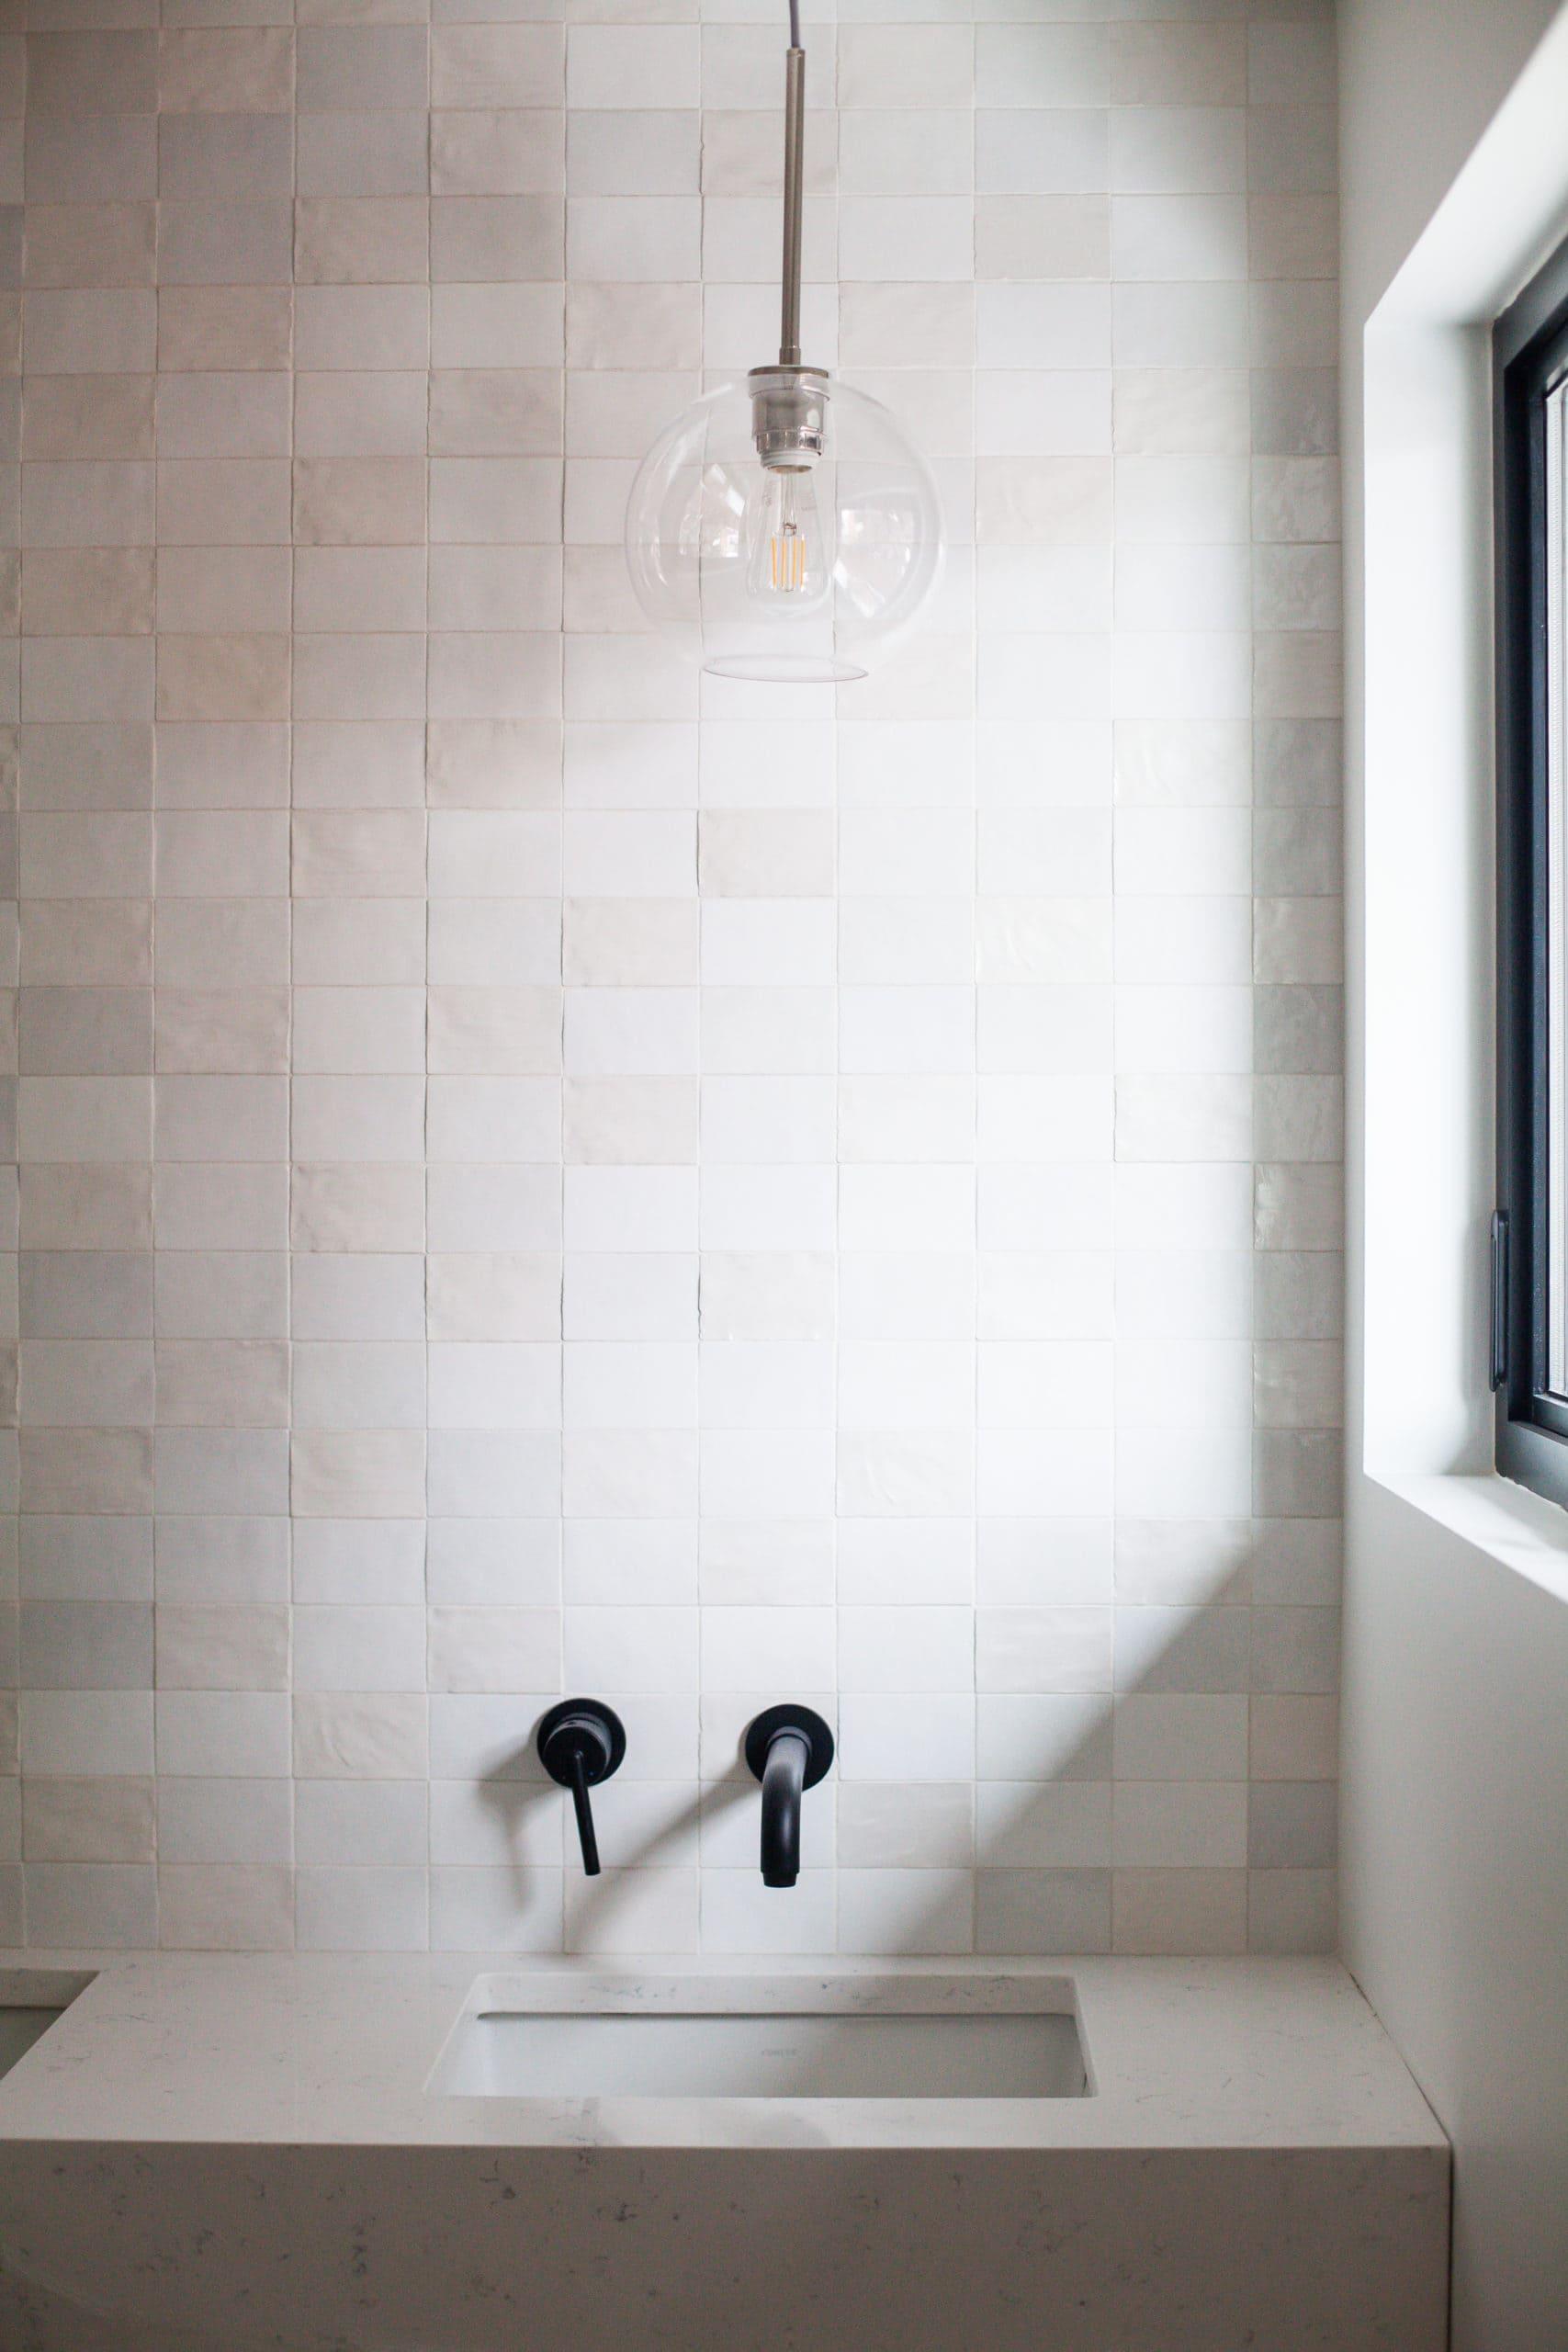 Full Home Renovation - Earthy Coastal Scandinavian California Minimal Master Bath Remodel